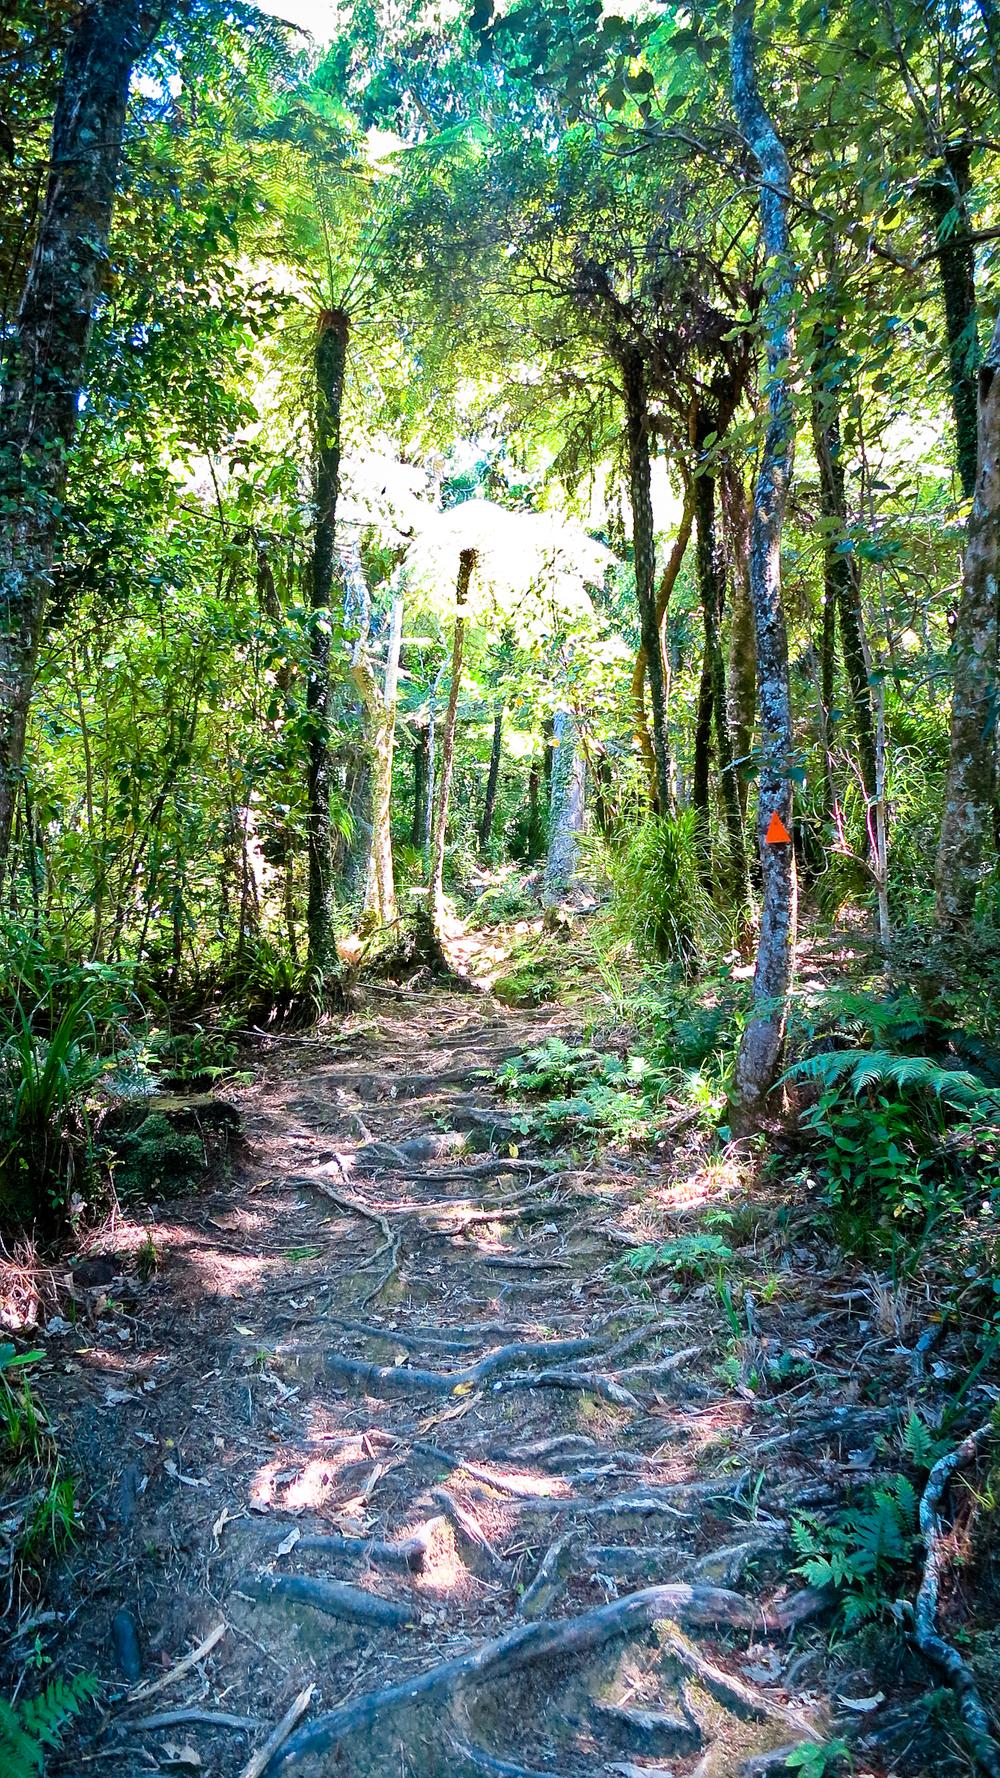 Hiking the Kauri Grove Walkway in New Zealand